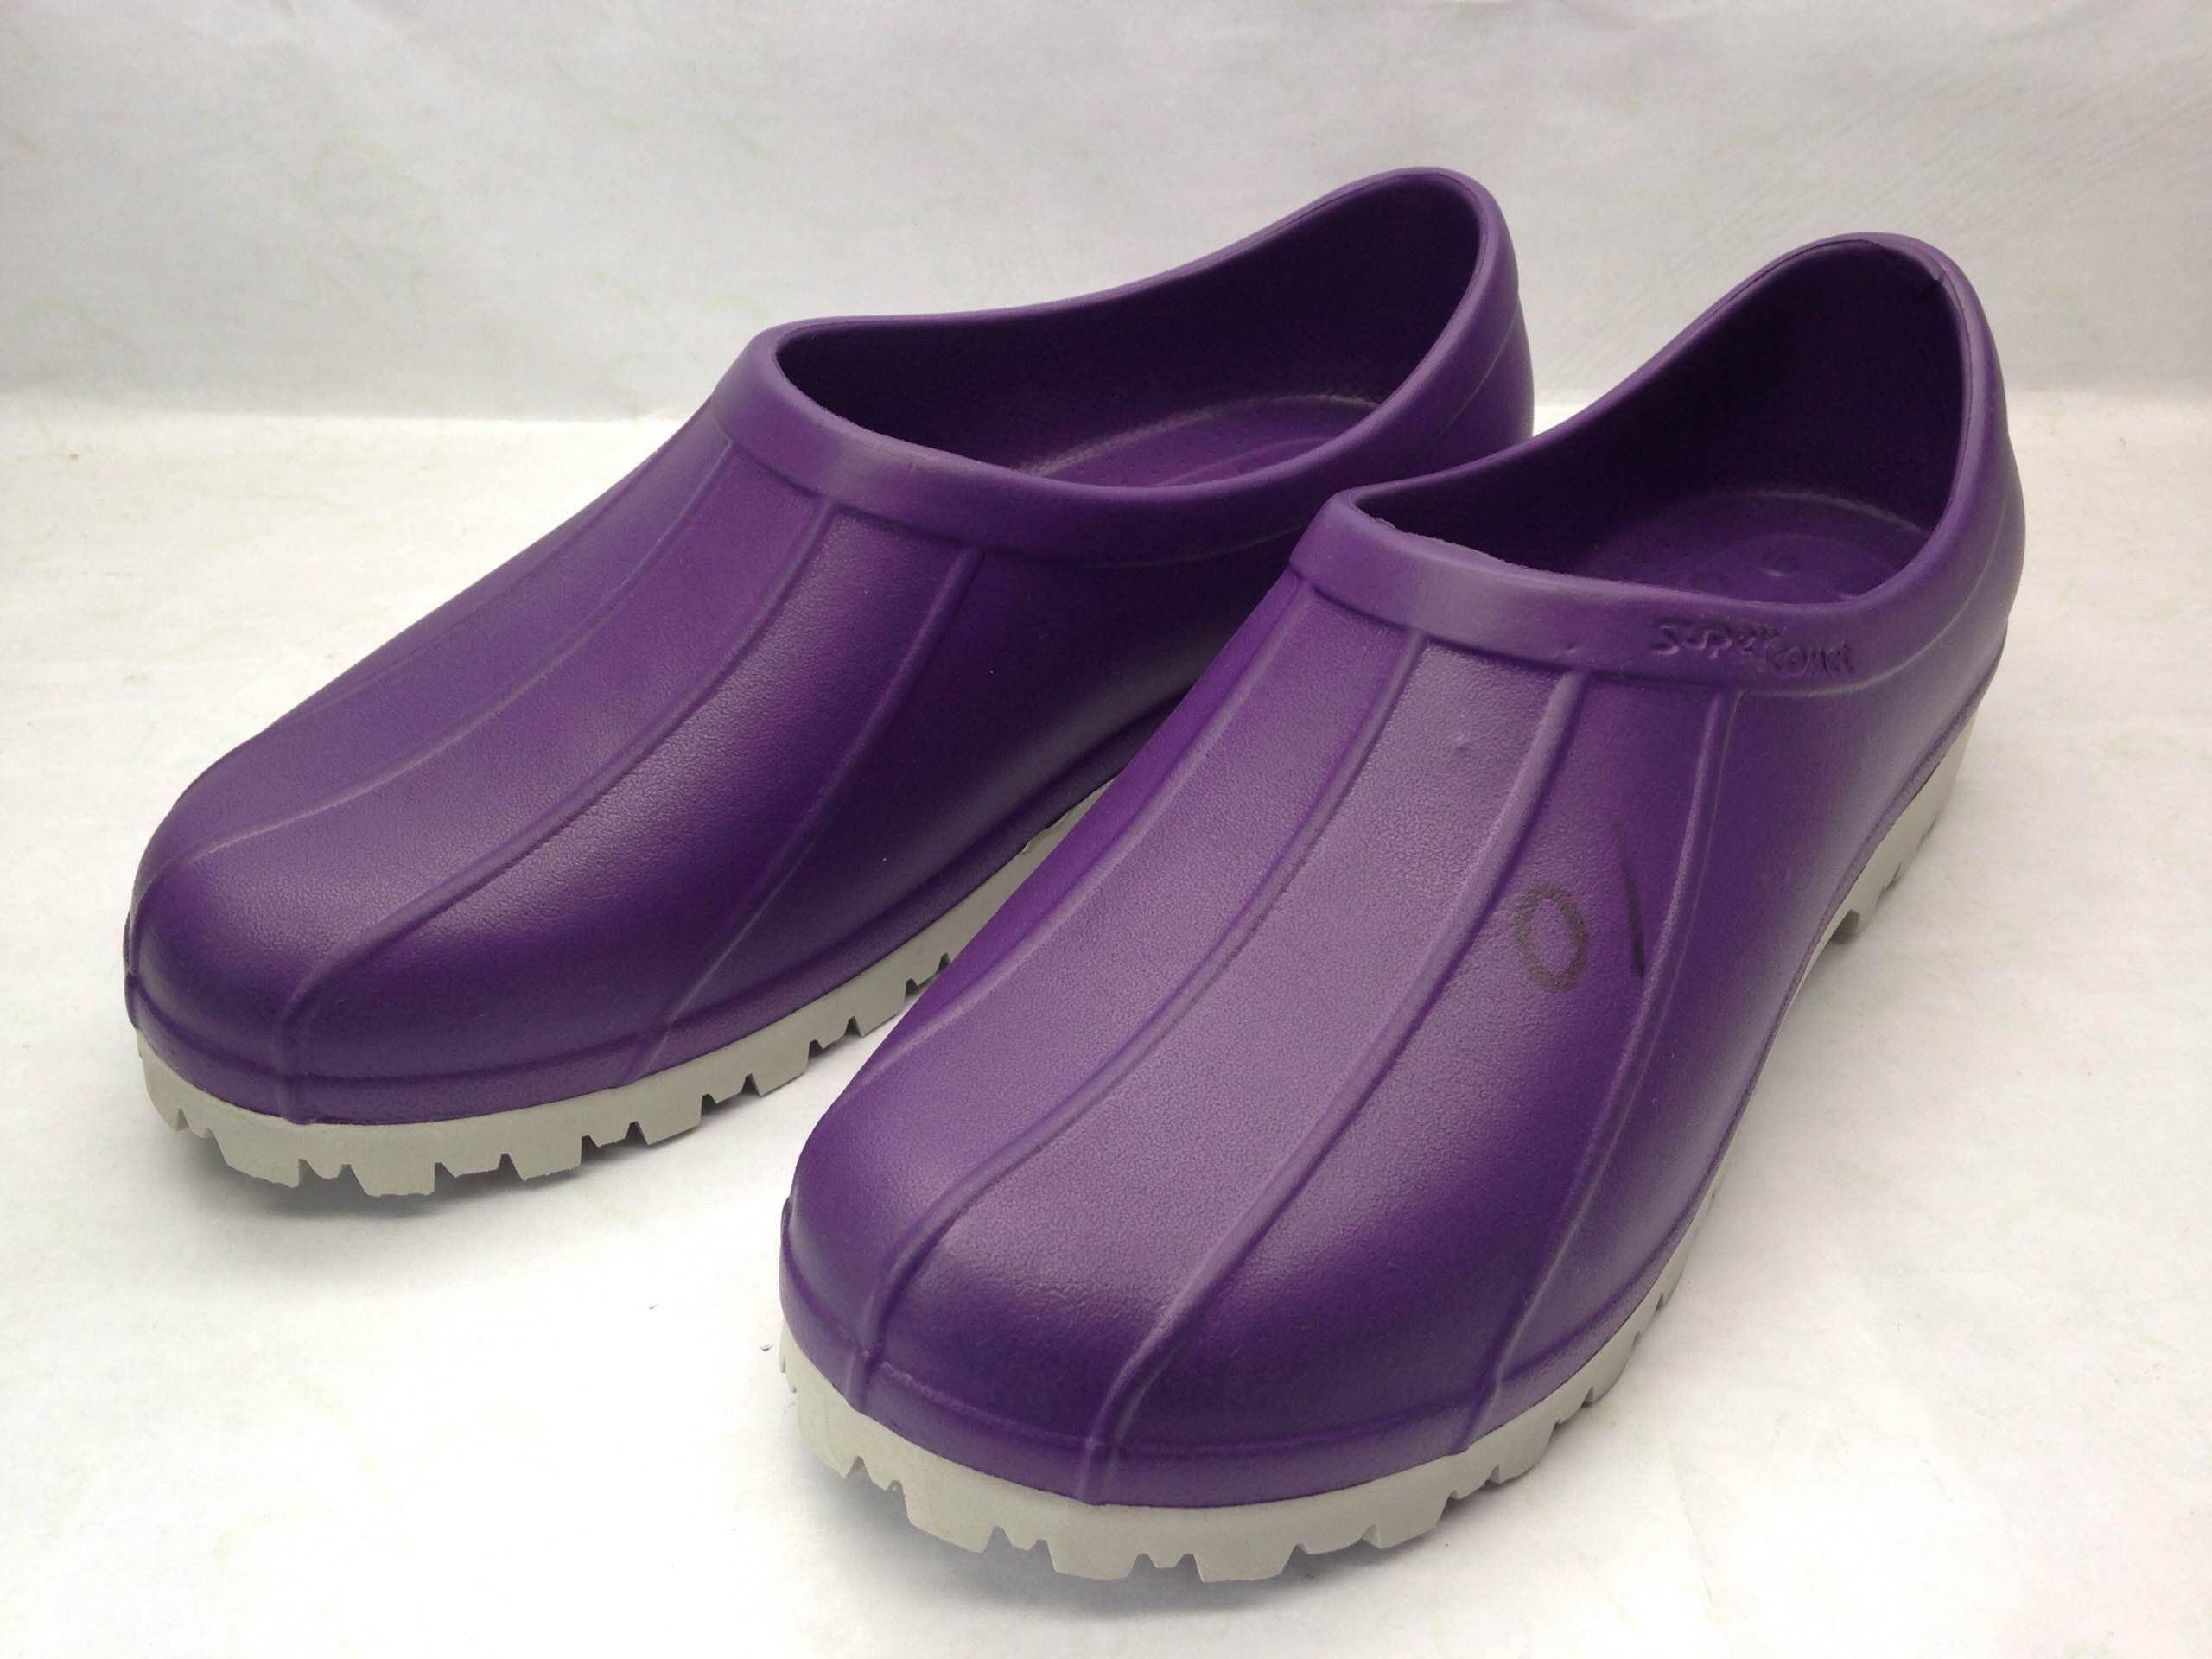 Waterproof TPE TPR TPU EVA Sandal Rain Shoes Clogs